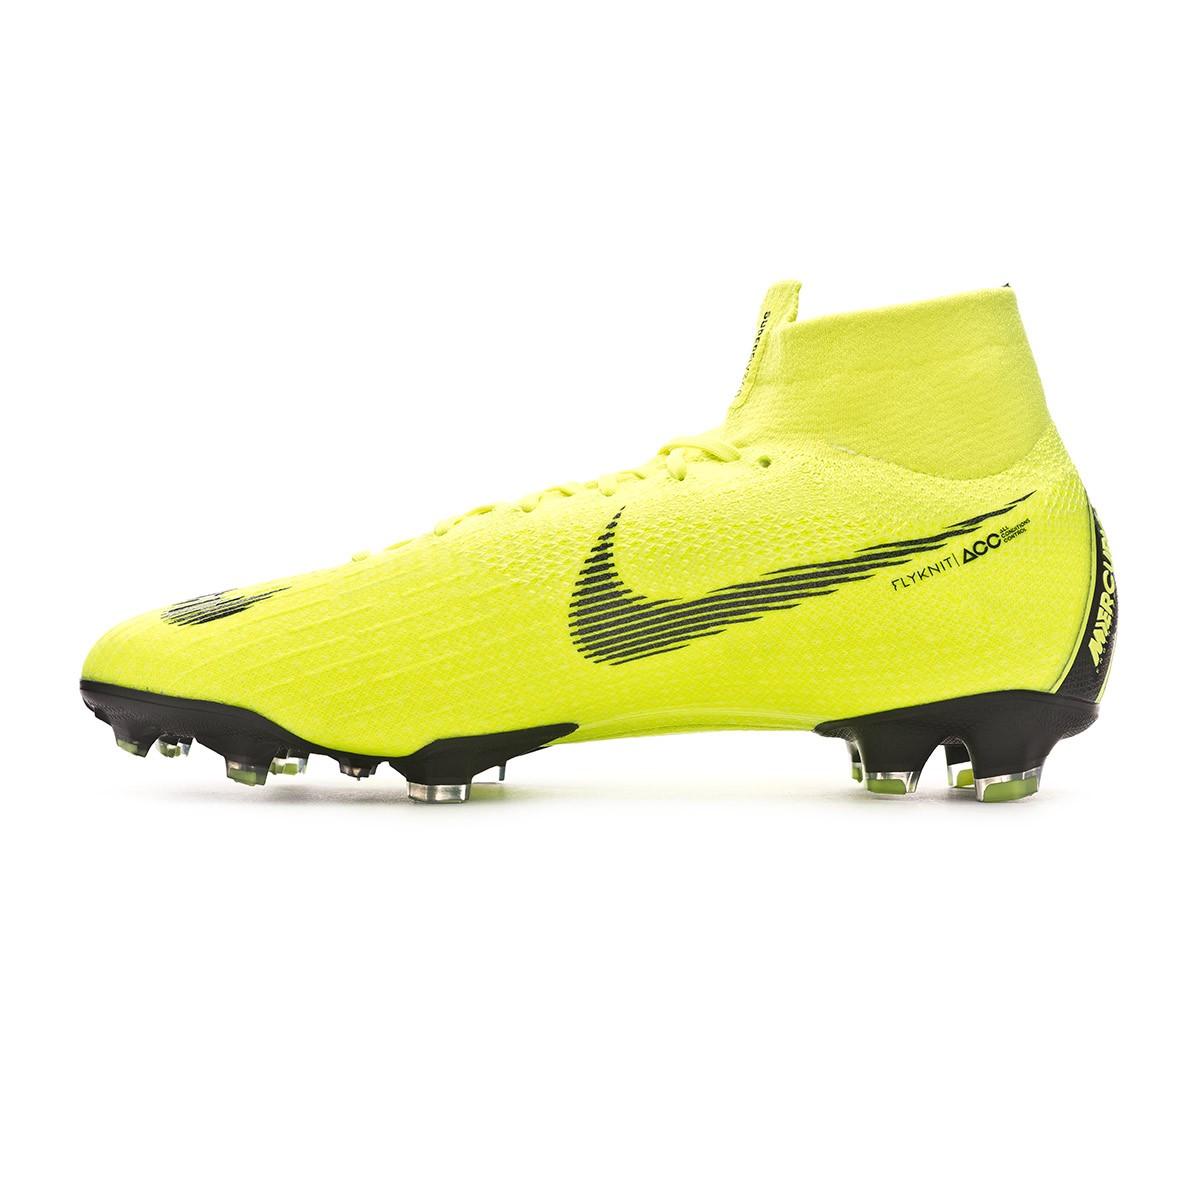 separation shoes 550b2 f50b1 Chaussure de foot Nike Mercurial Superfly VI Elite FG Volt-Black - Tienda  de fútbol Fútbol Emotion